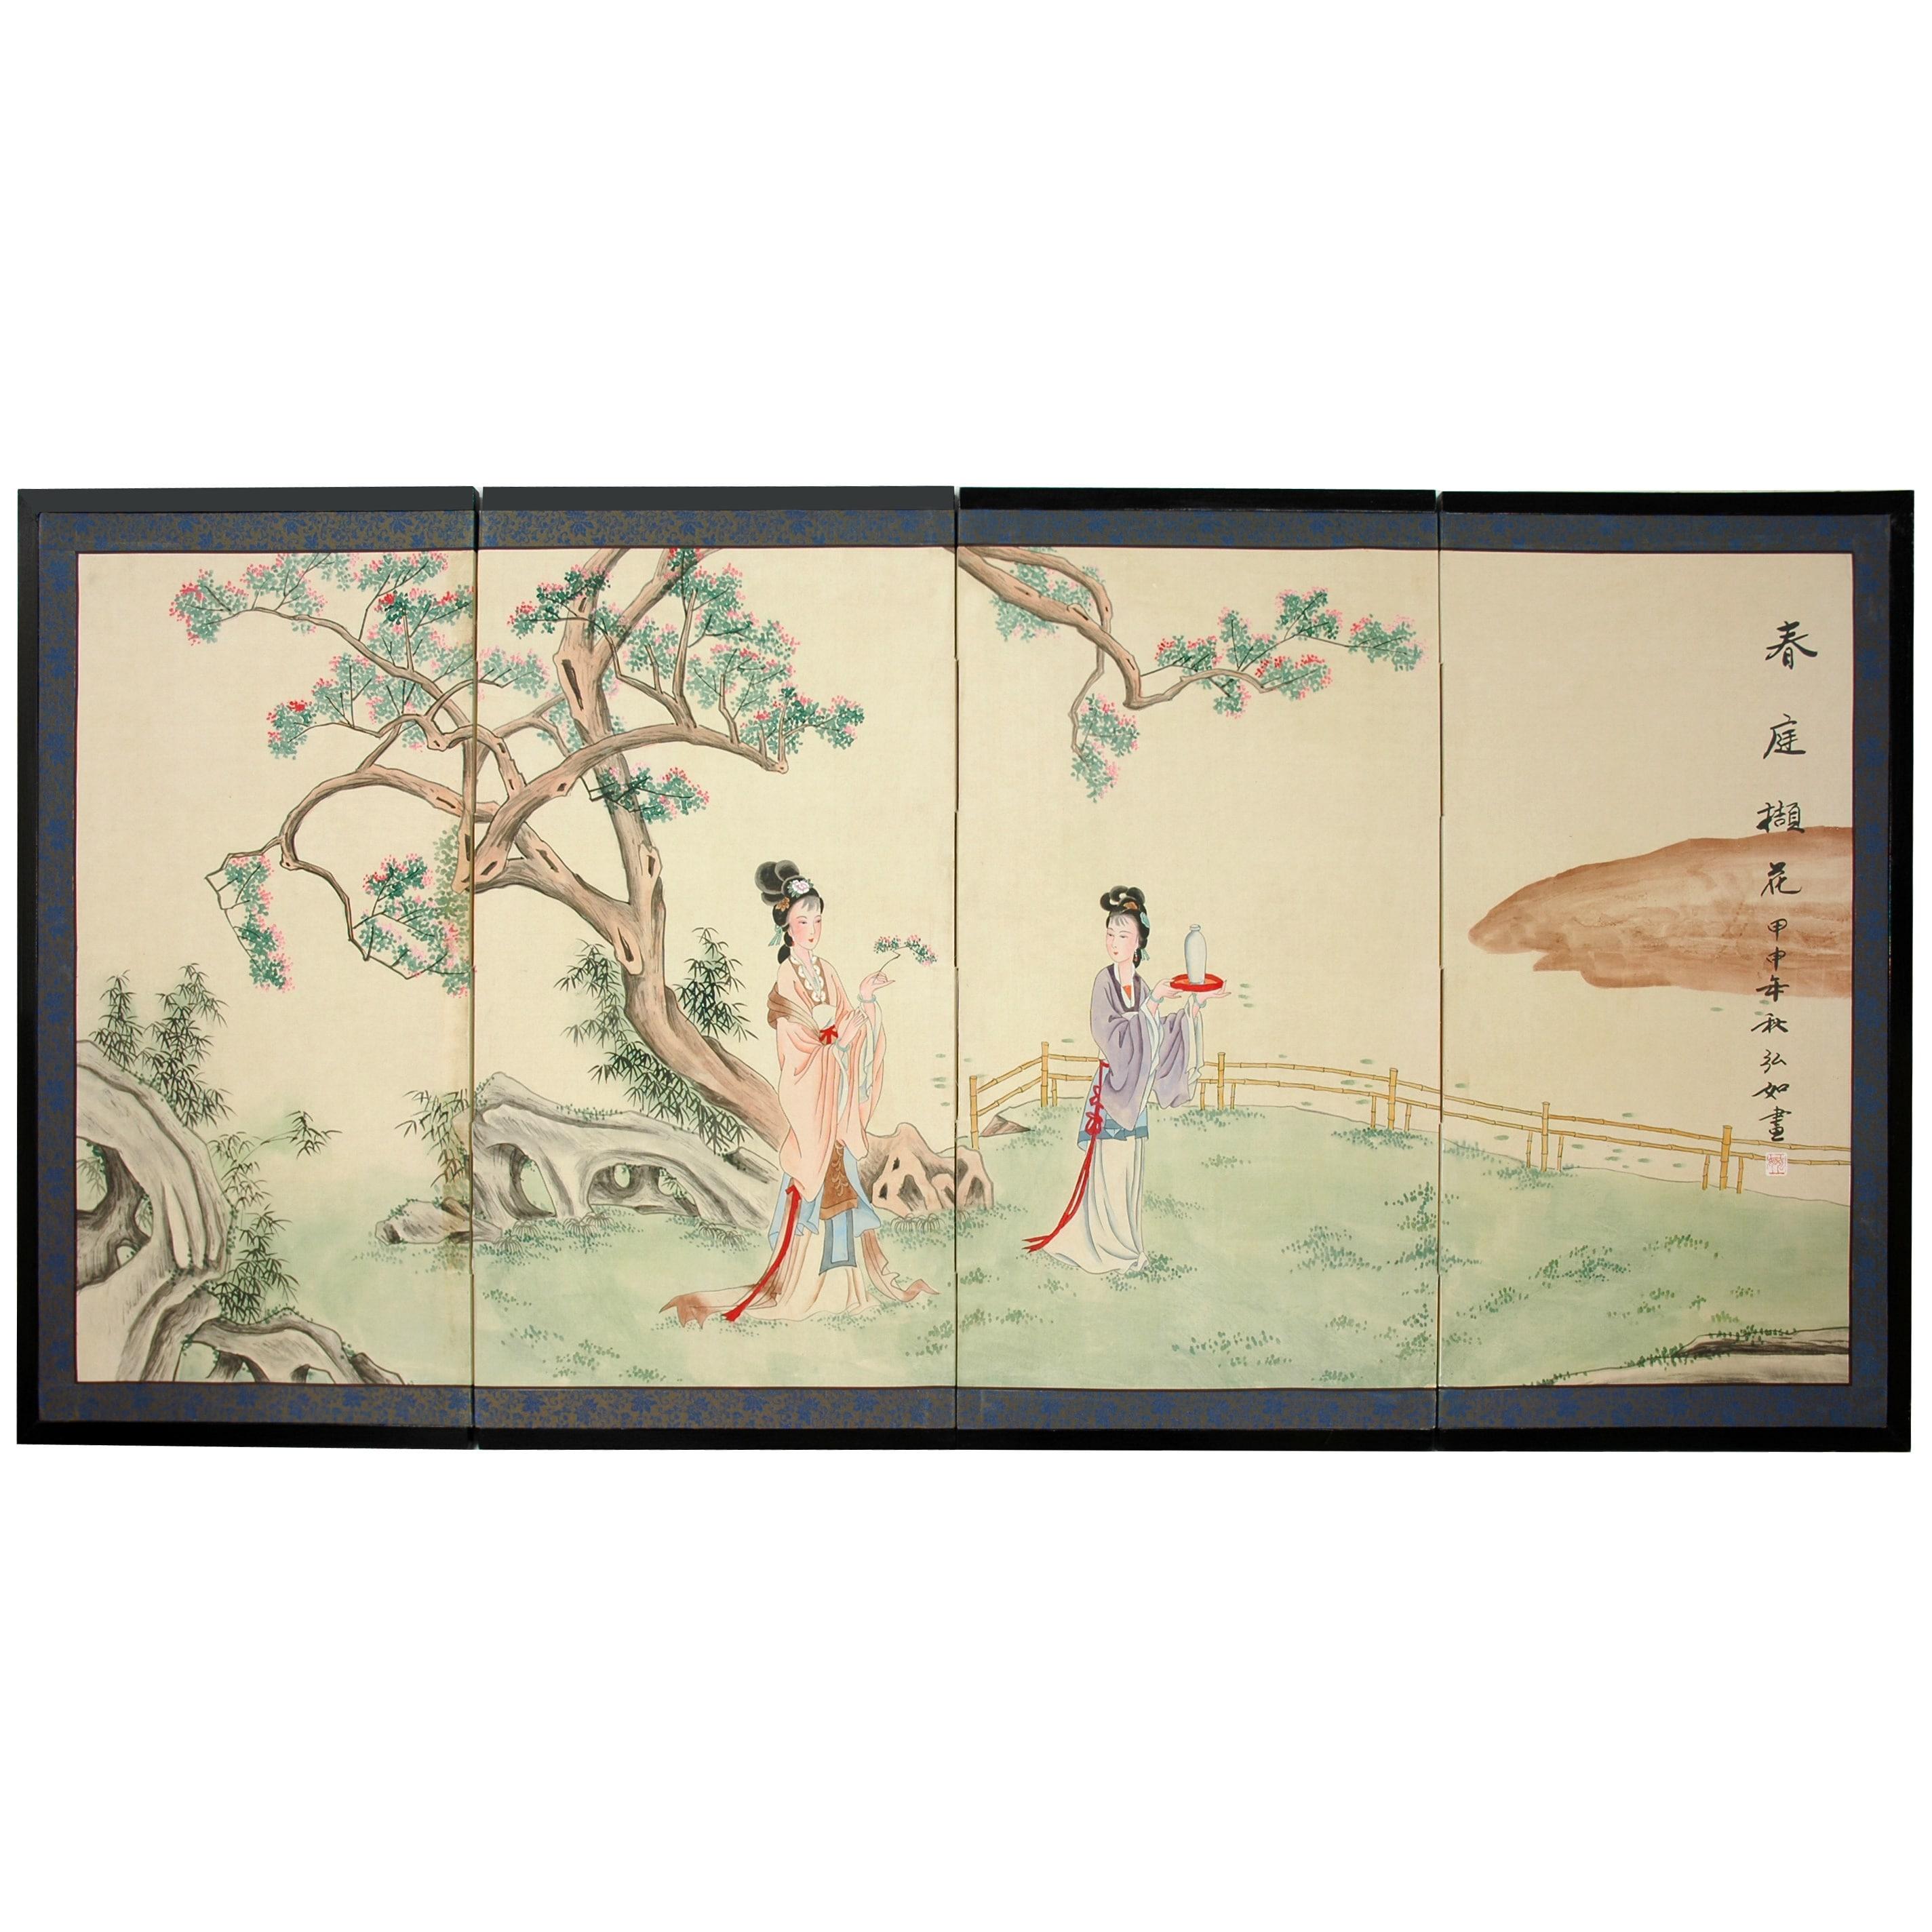 Handmade 'Gift of the Flower' Silk Painted Room Divider (...